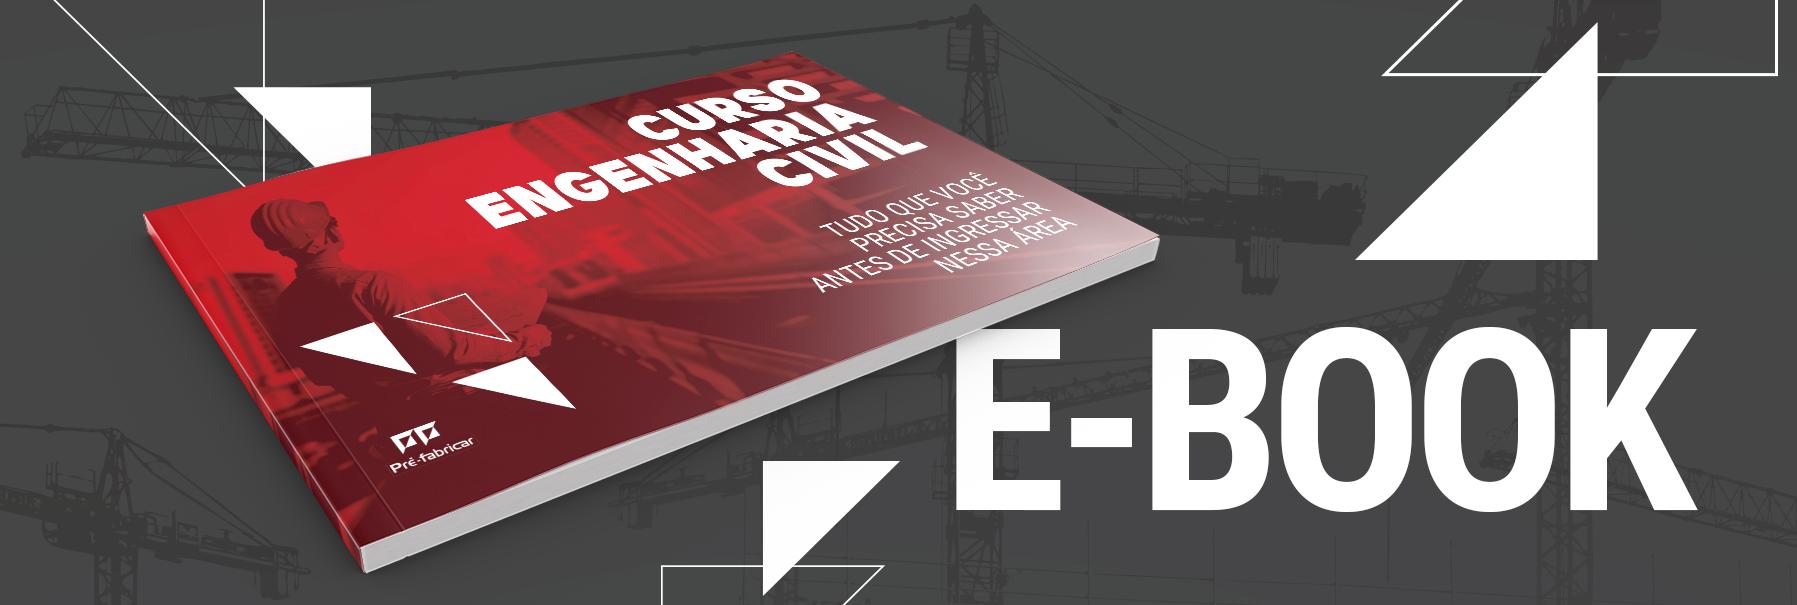 ebook curso de engenharia civil